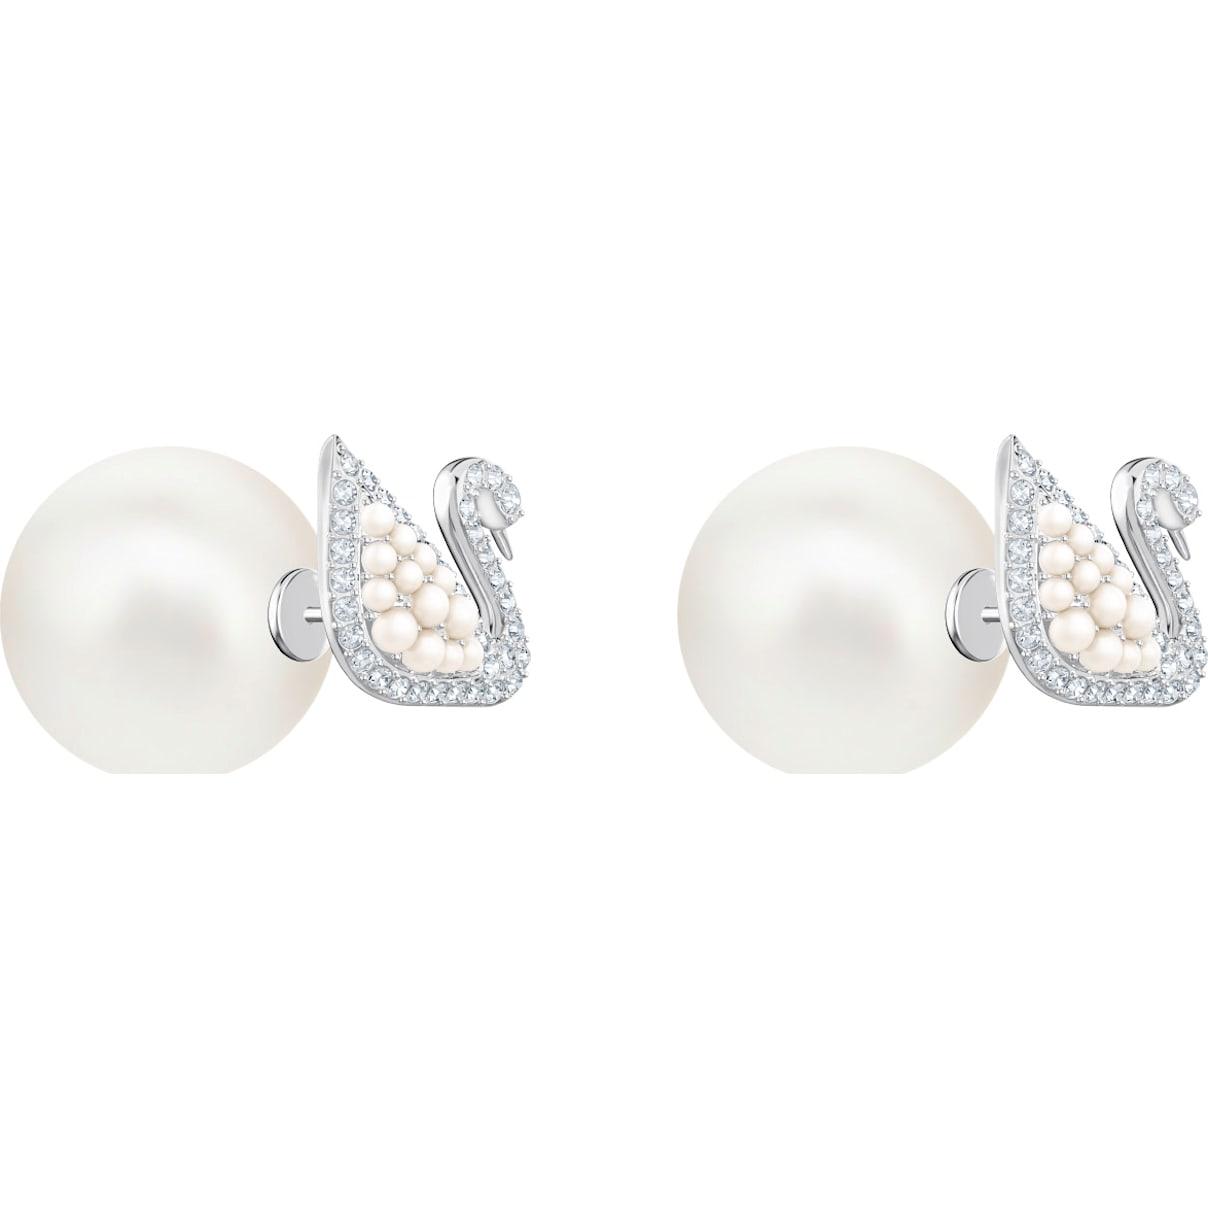 Swarovski Iconic Swan Stud Pierced Earrings, White, Rhodium plating